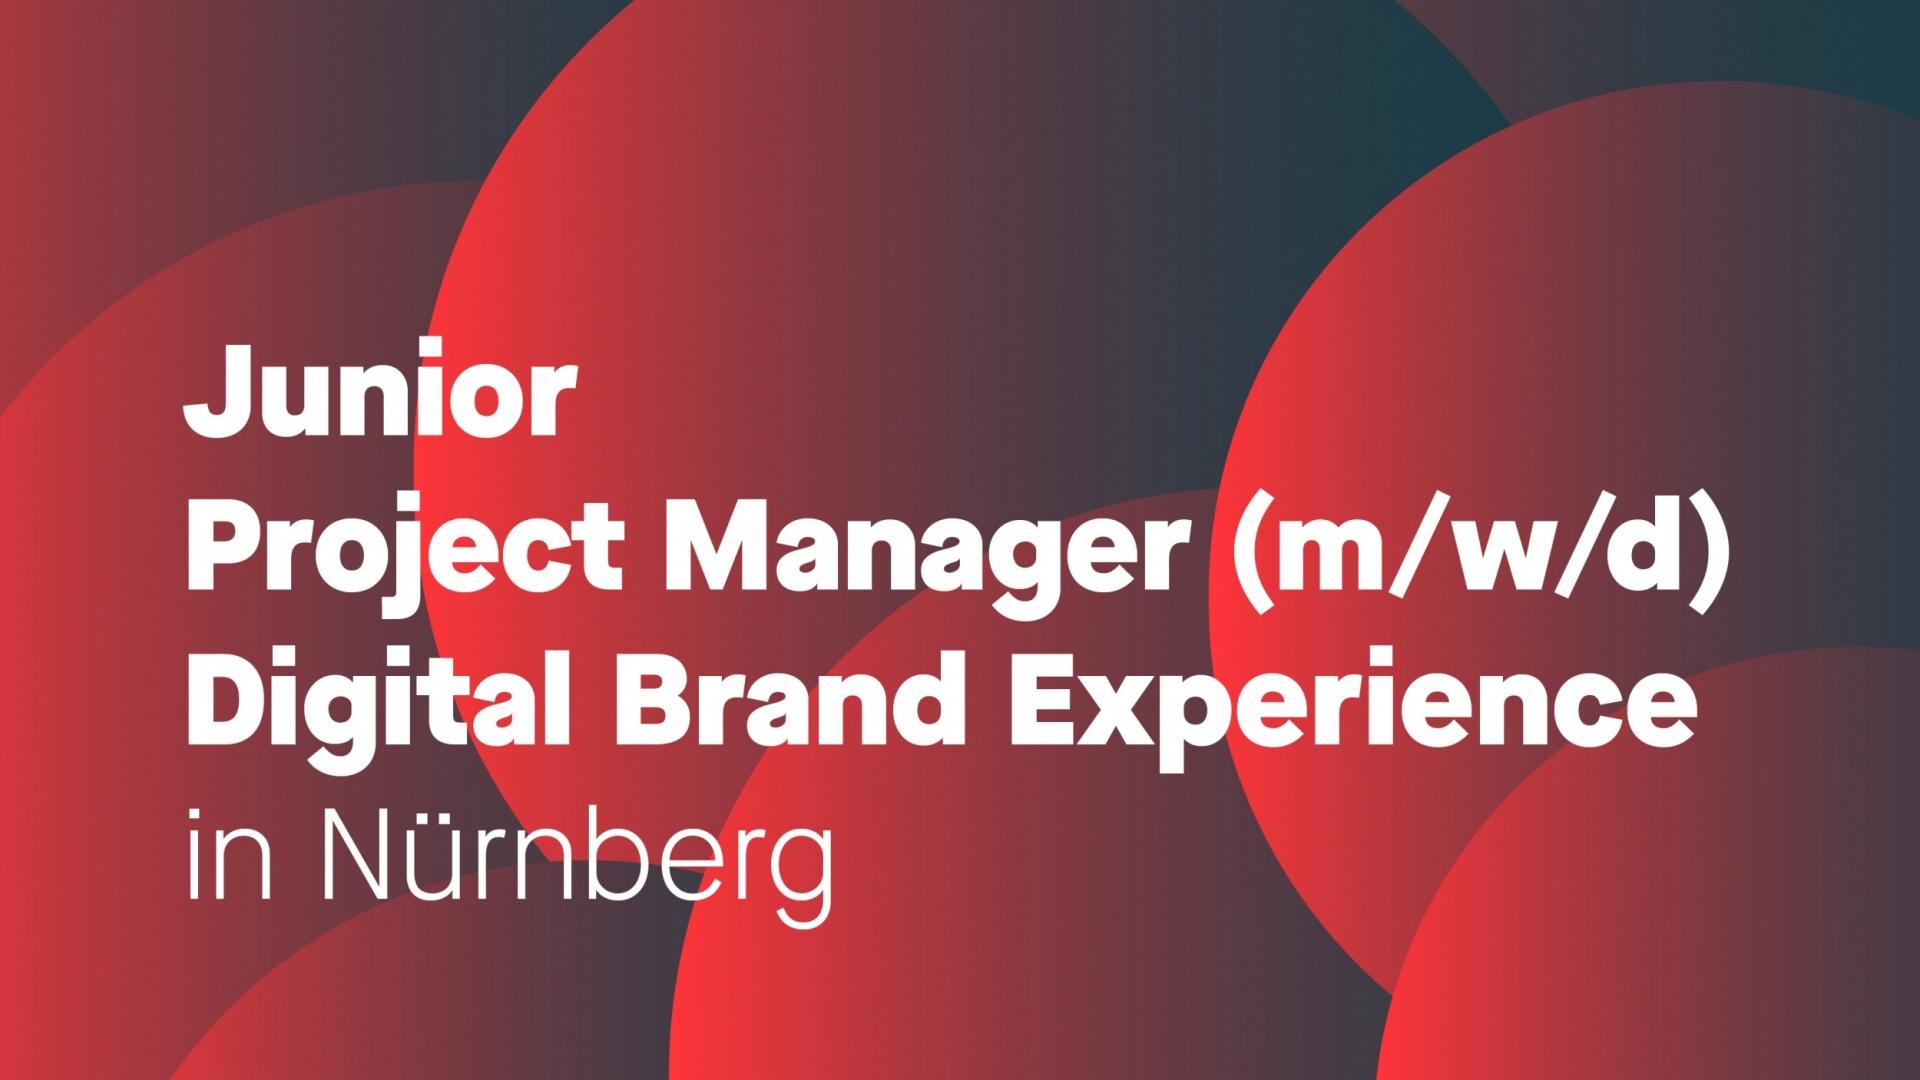 Junior Project Management Digital Brand Experience (m/w/d)